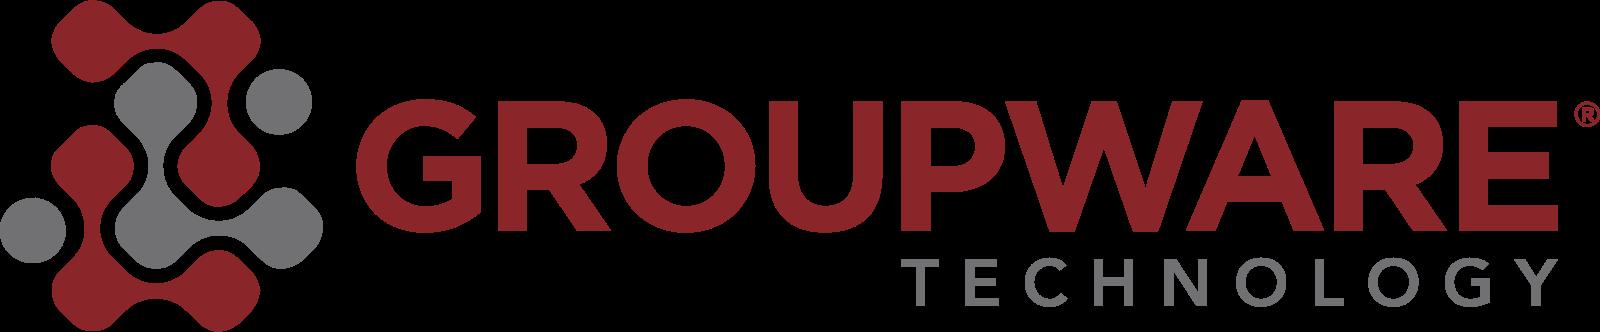 Groupware Technology Logo